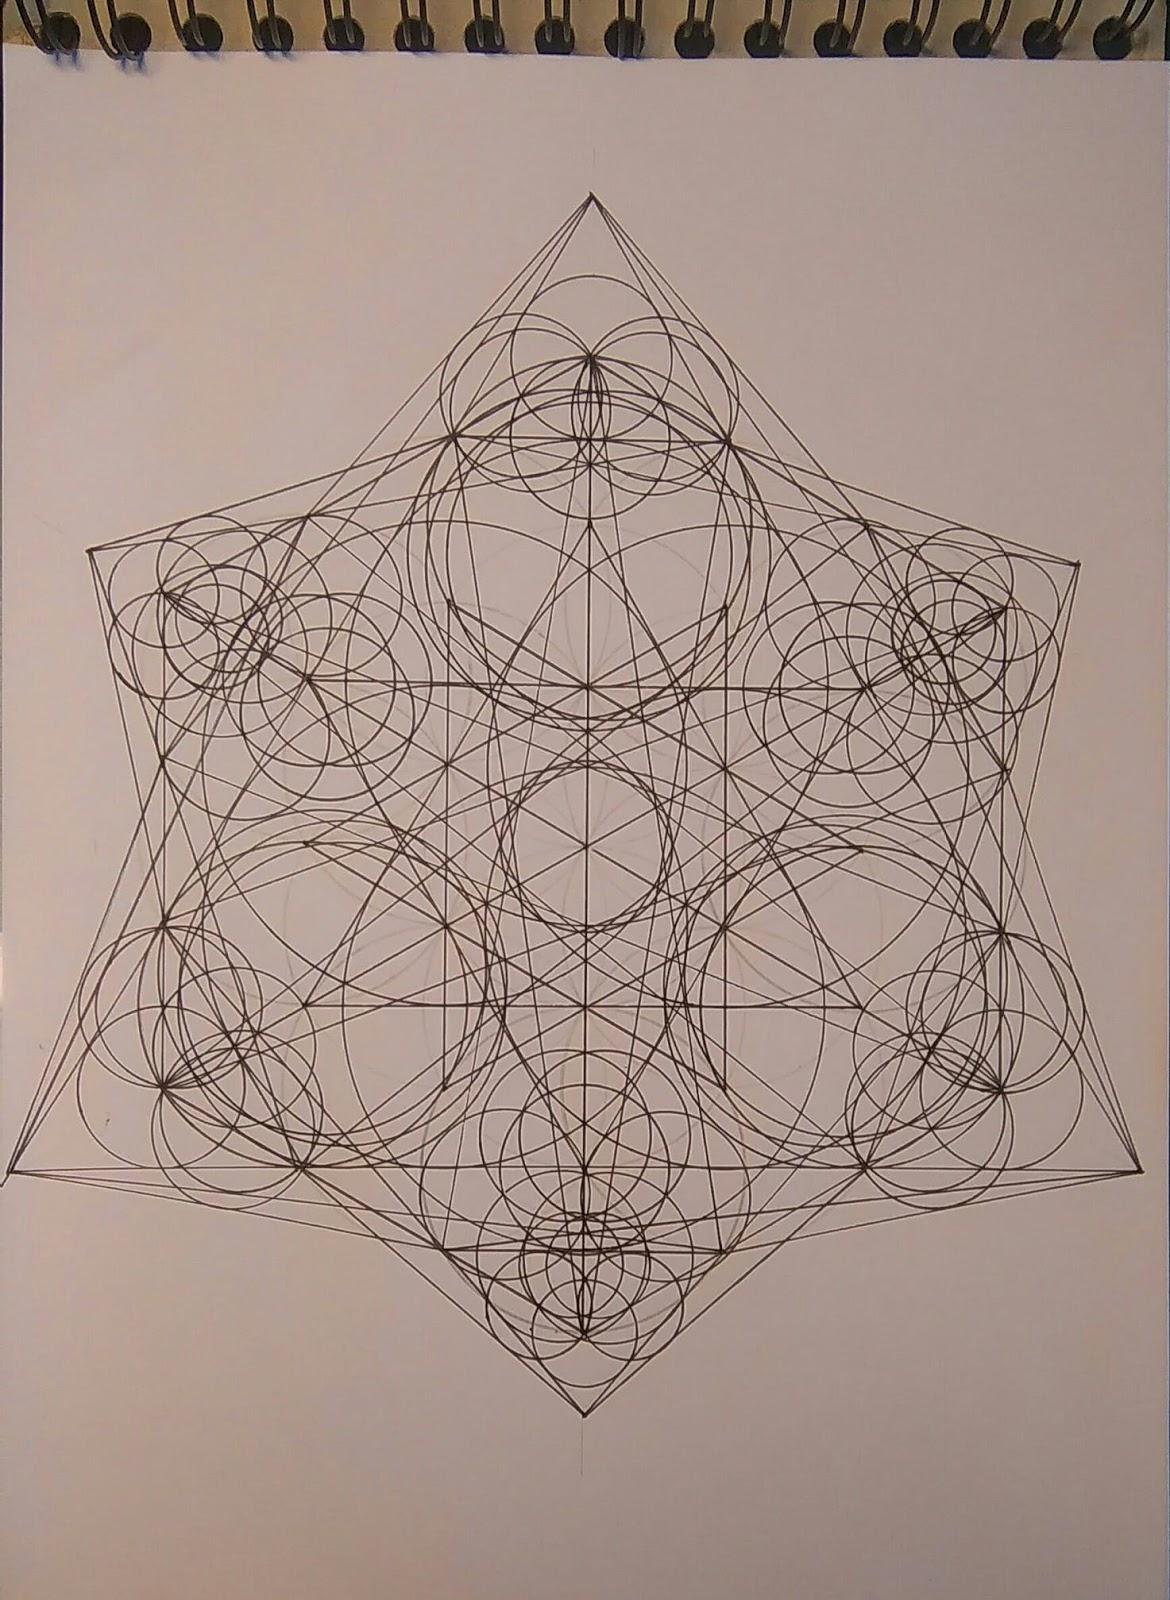 [SPOLYK] - Geometries & sketches - Page 6 47356857_1099324280254255_5719608334630256640_o